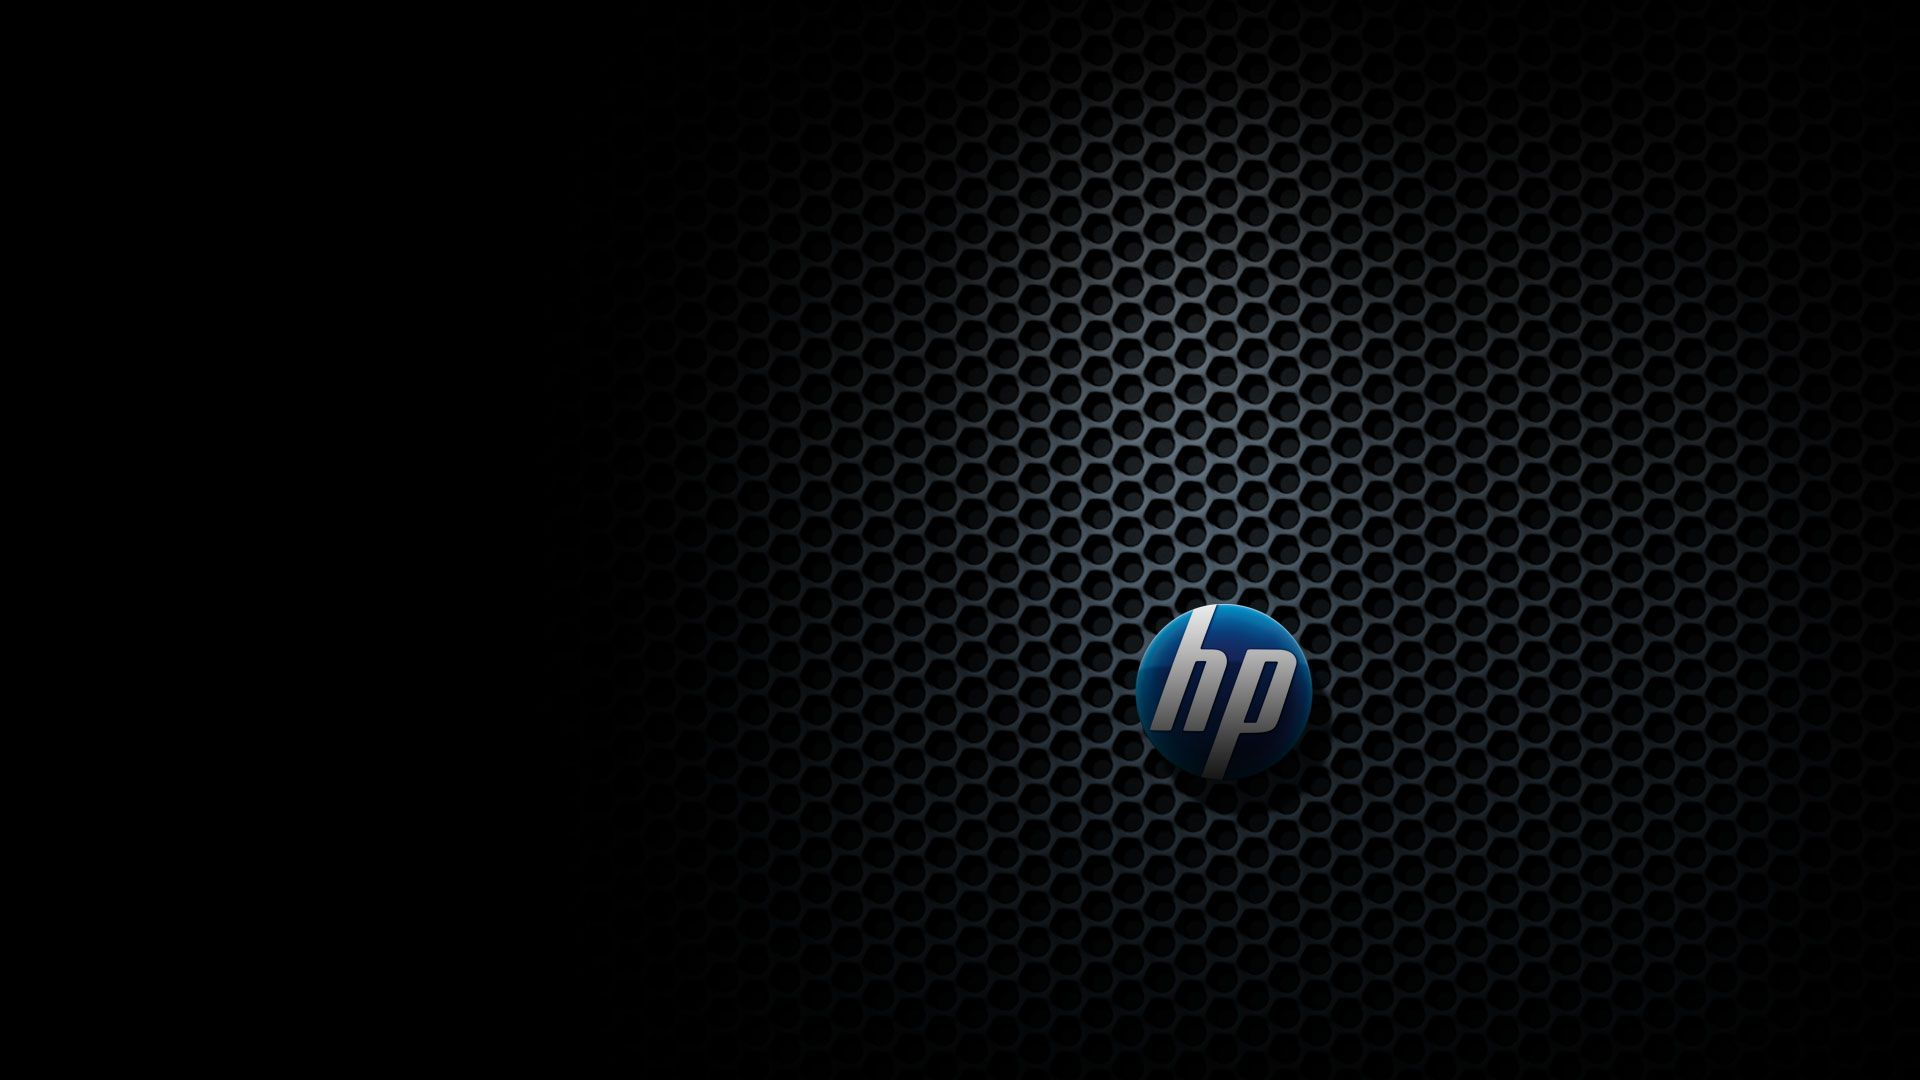 Download 6000 Koleksi Wallpaper For Hp Laptop Hd Quality Free Download Terbaik